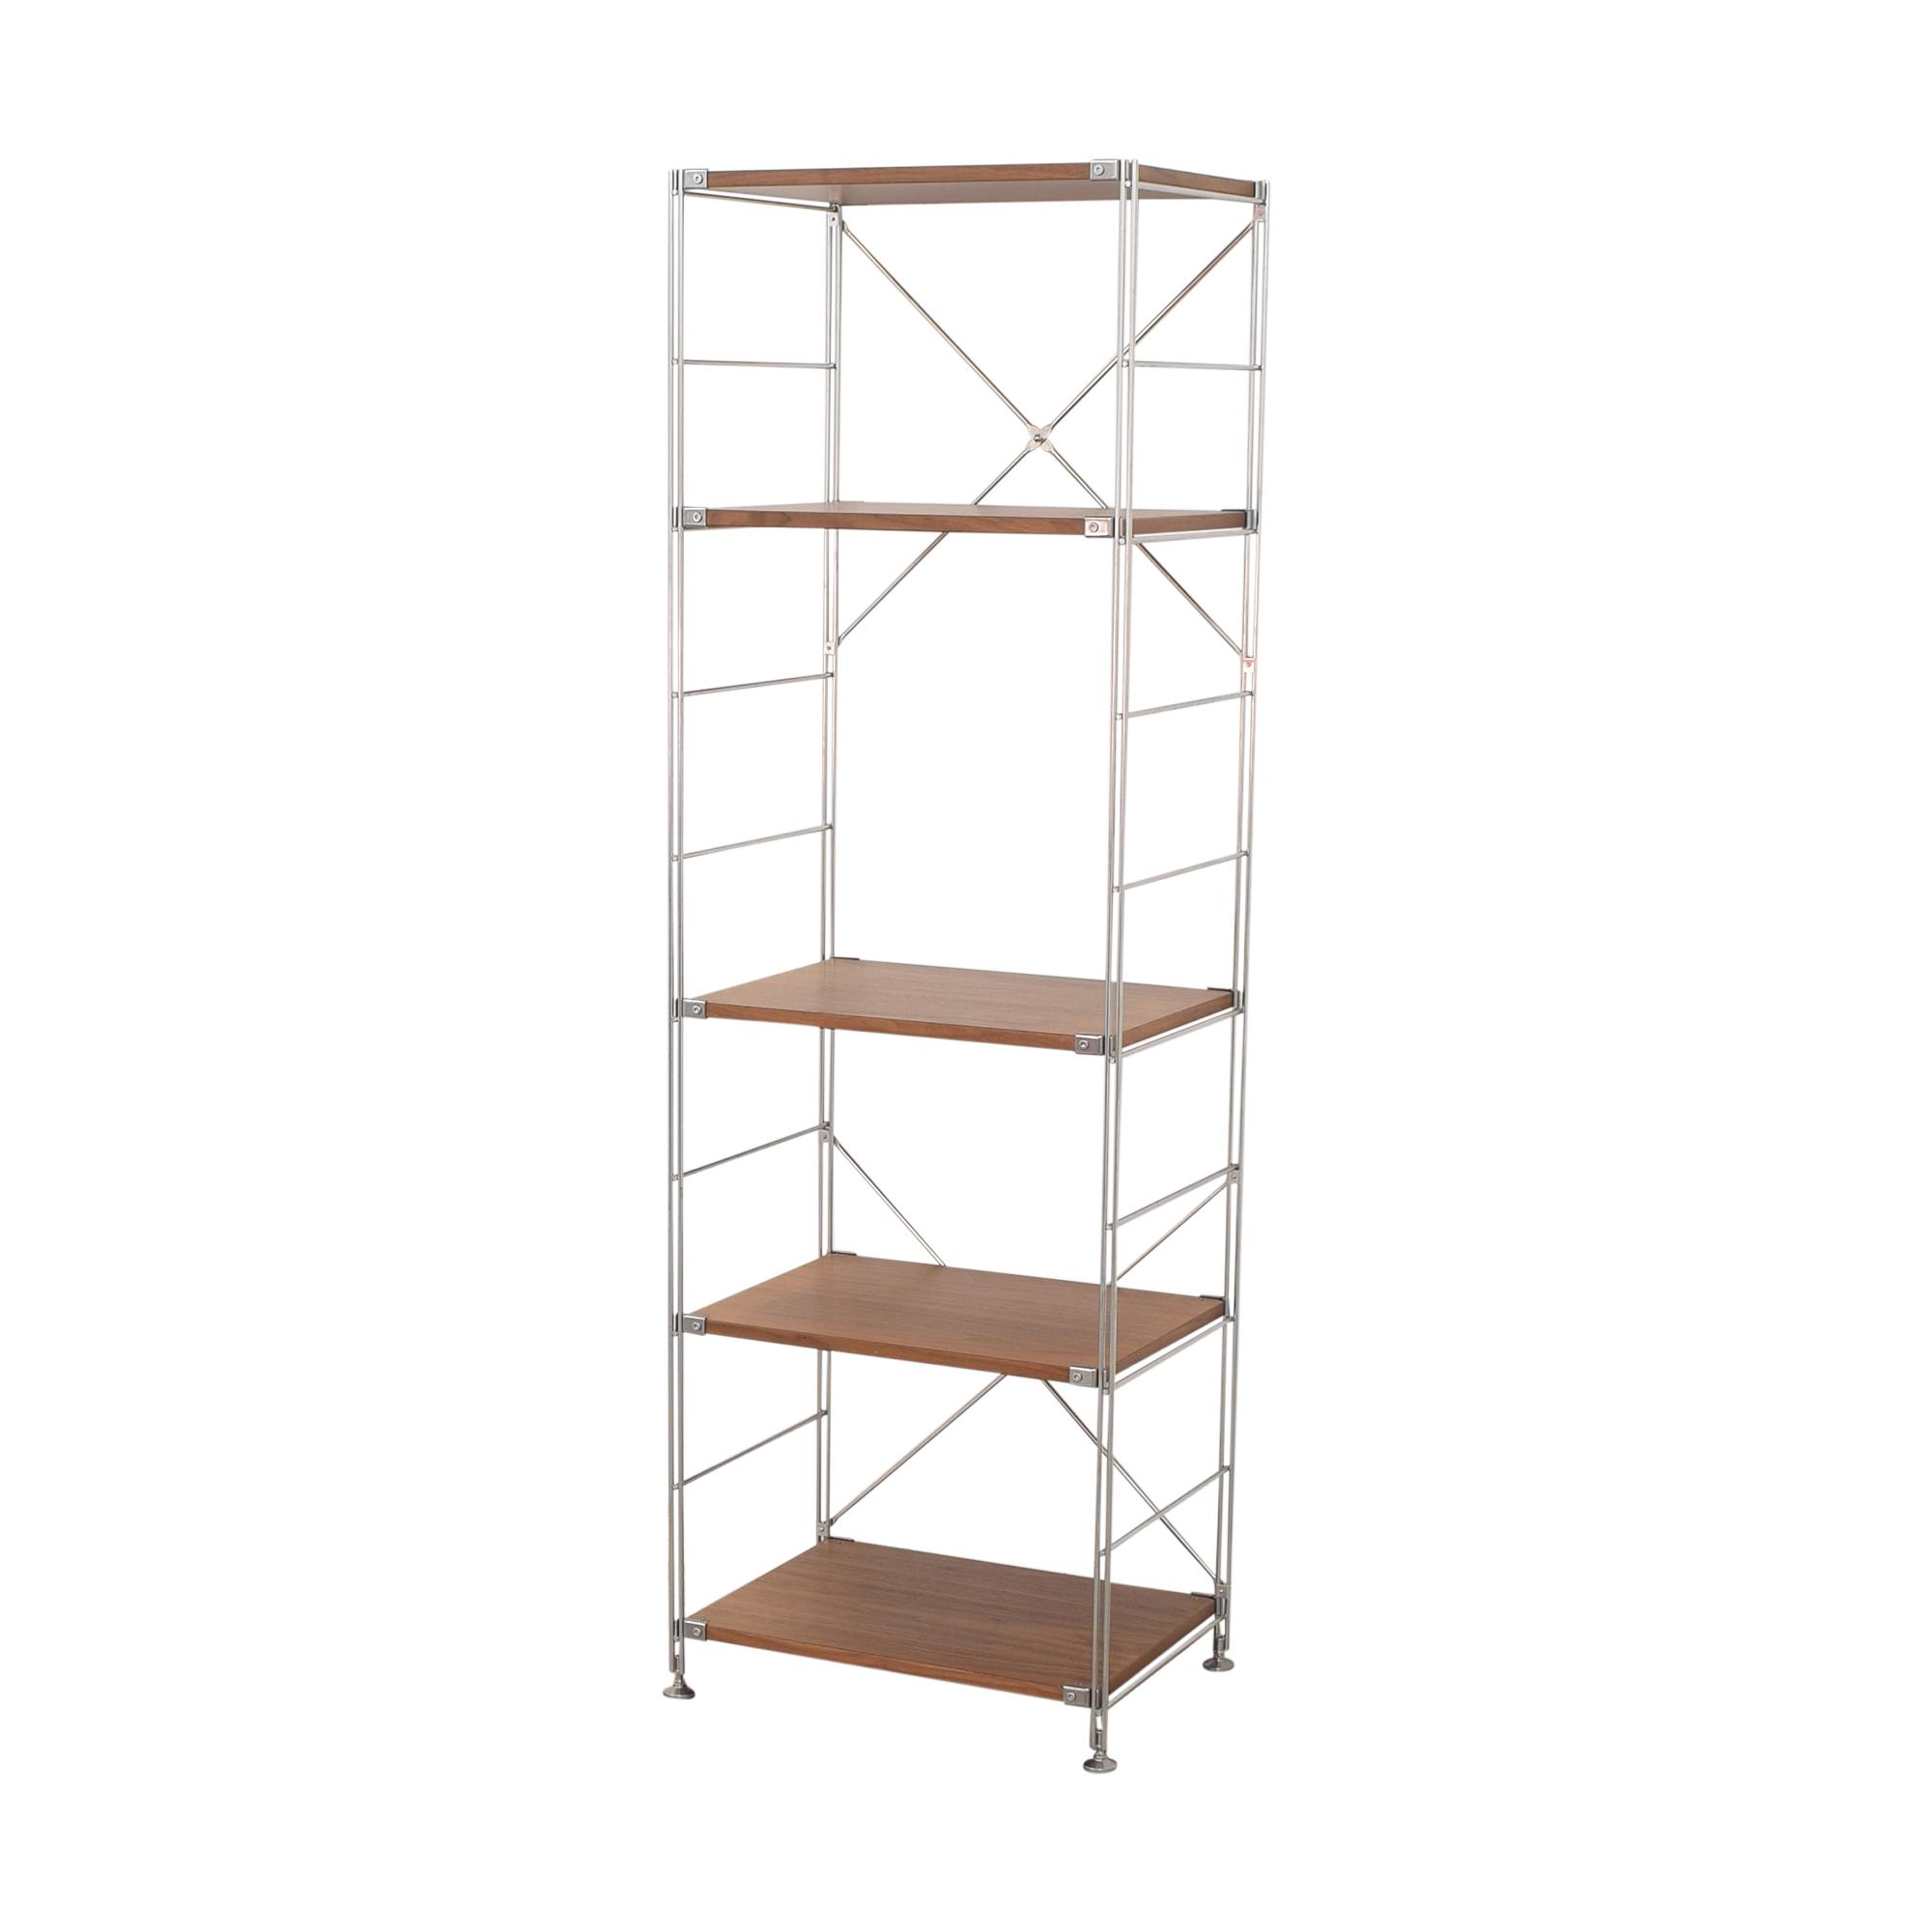 Muji Minimalist Shelf Set / Bookcases & Shelving